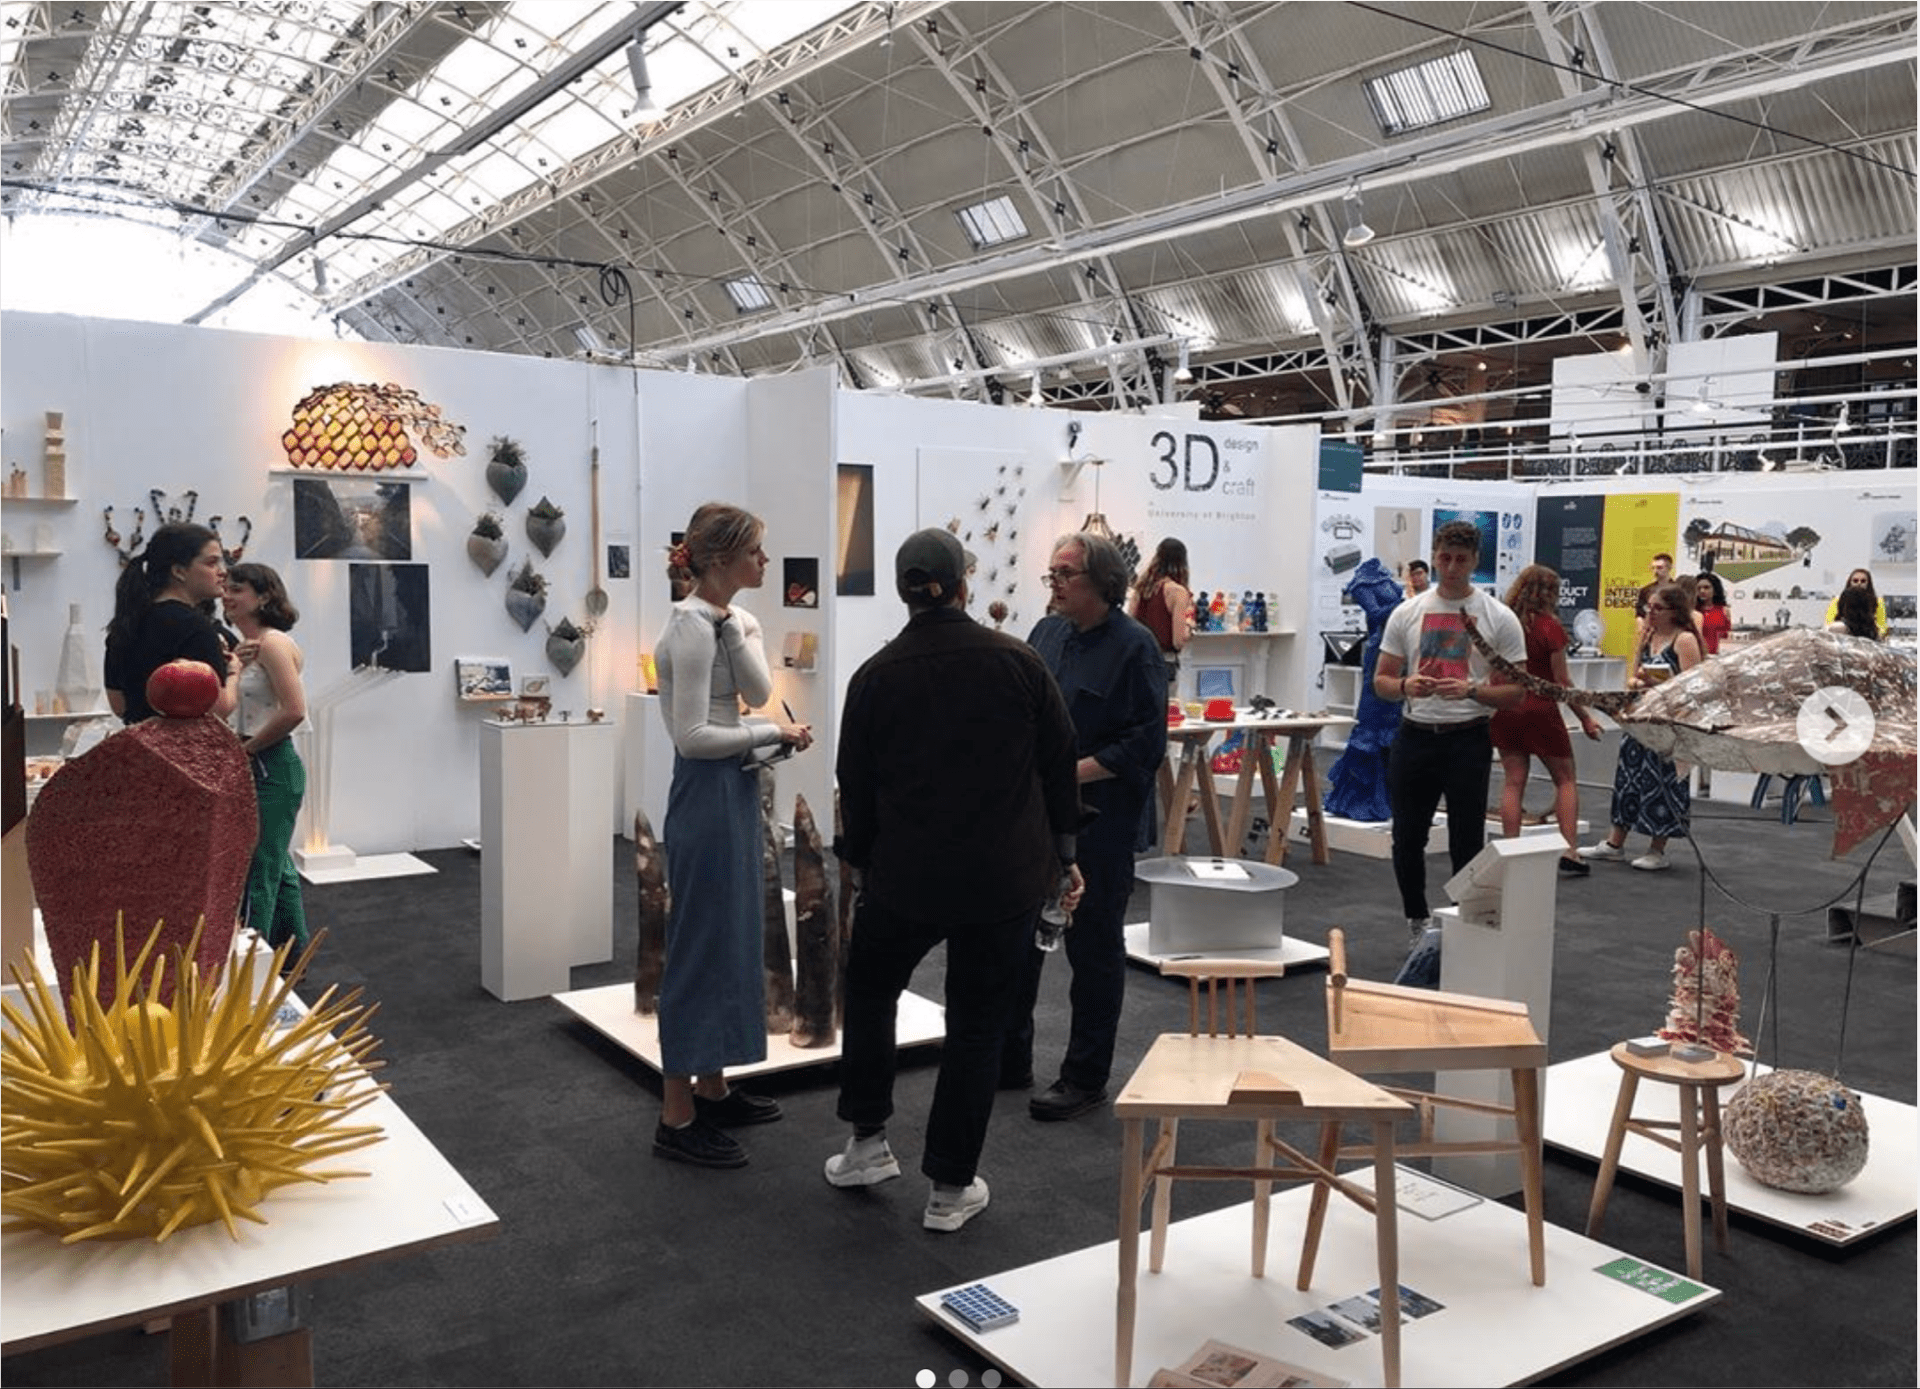 3D Design at New Designers